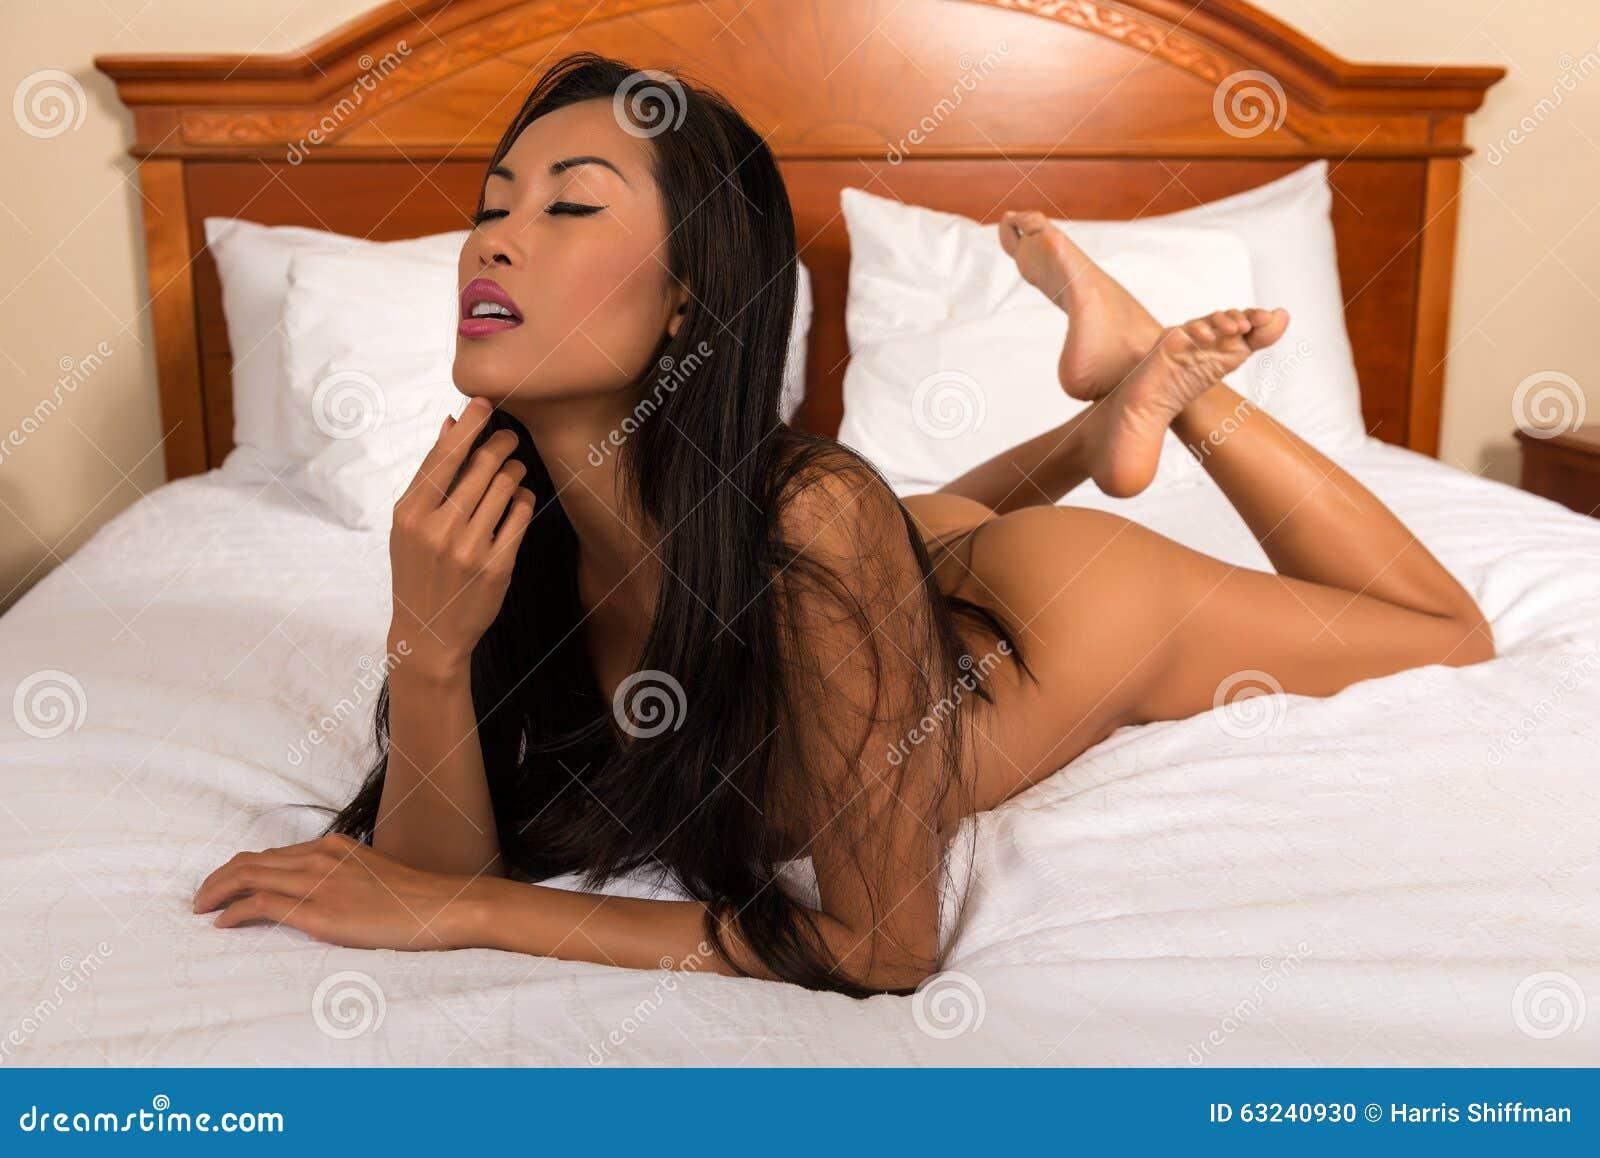 black booty transexuls sex videos